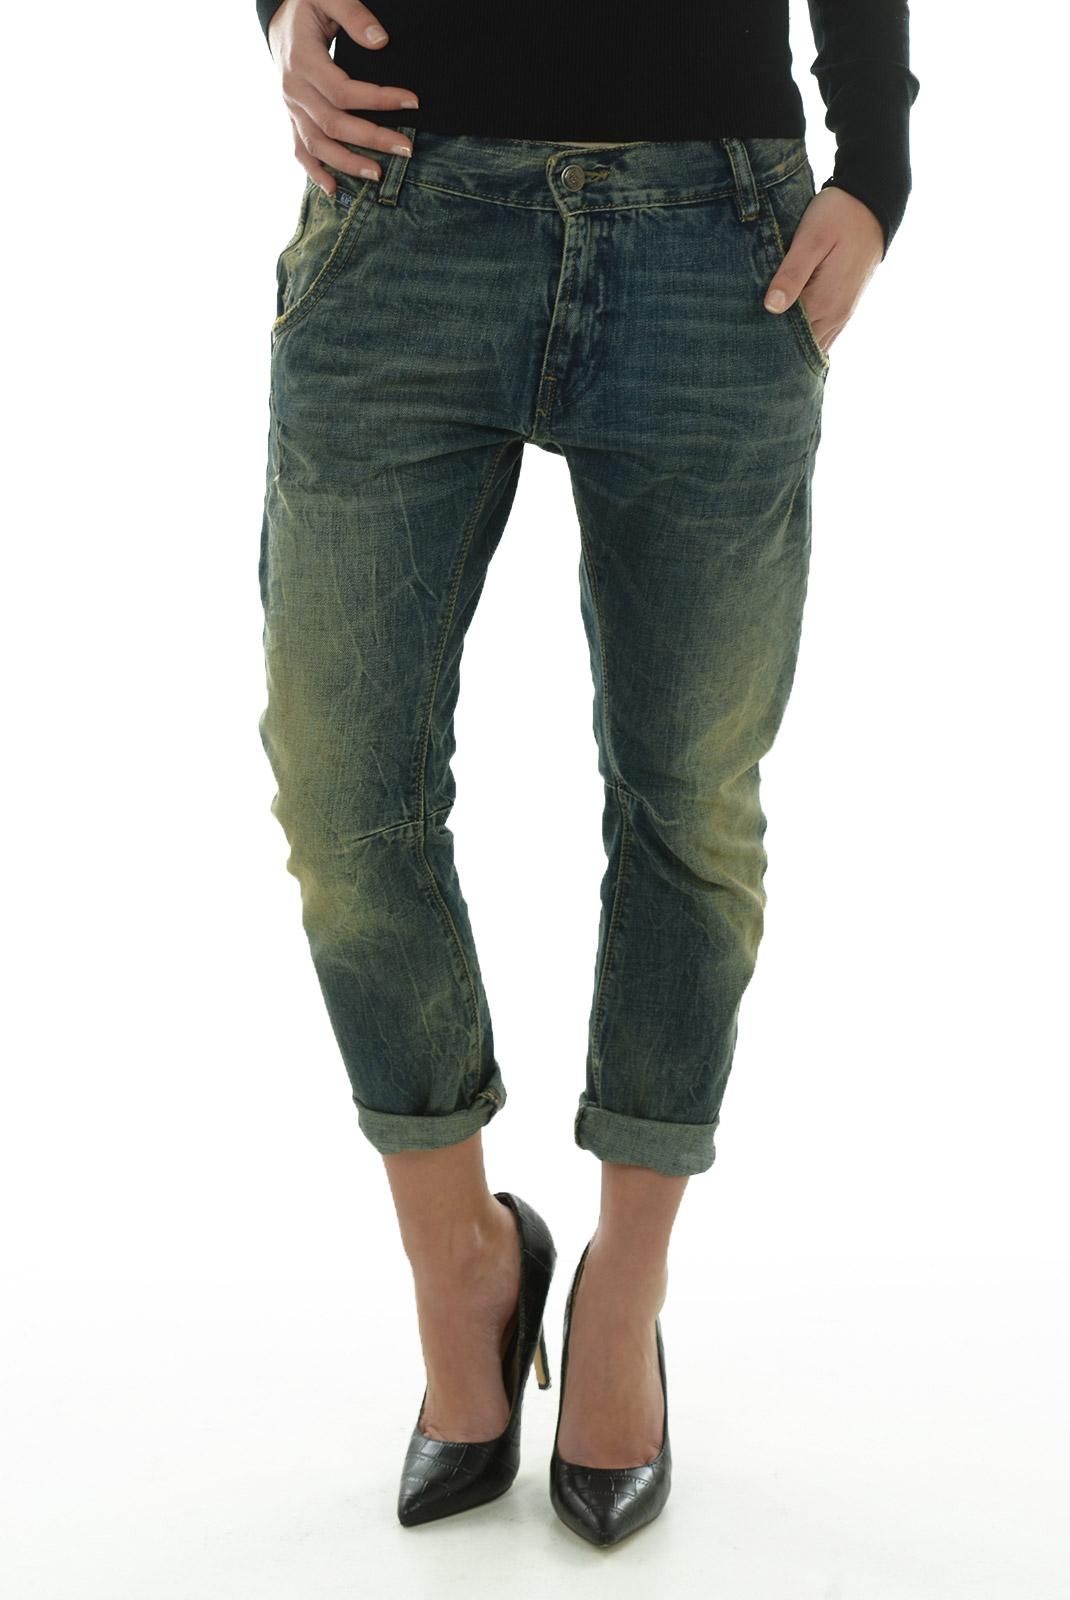 jeans boyfriend femme kaporal pixi dust. Black Bedroom Furniture Sets. Home Design Ideas